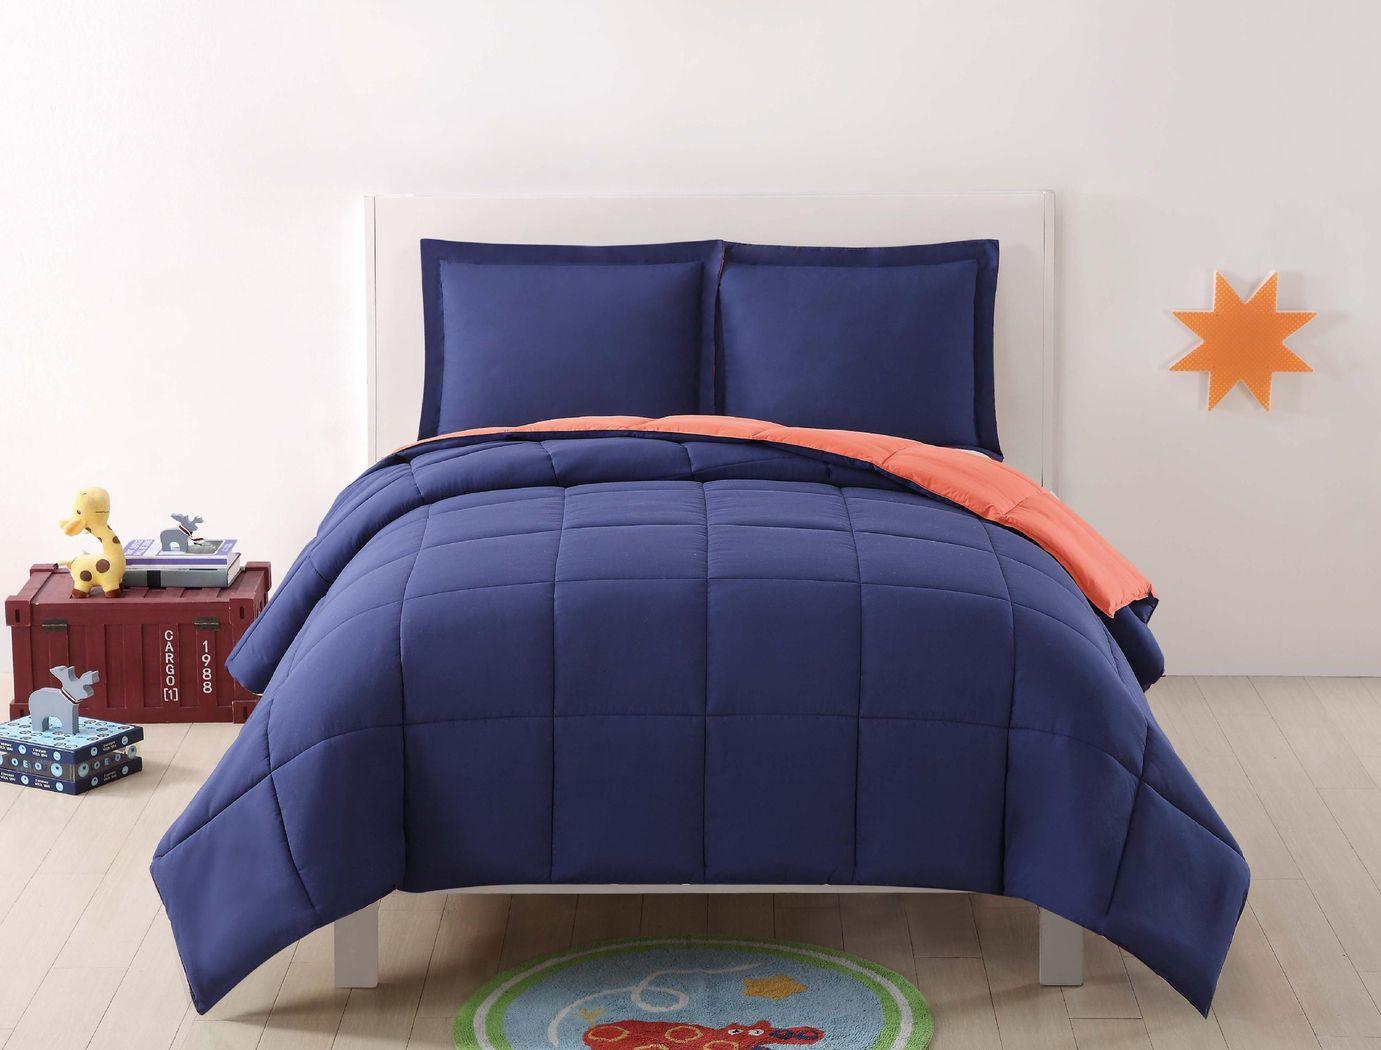 Kids Boyette Navy/Orange 2 Pc Twin Comforter Set